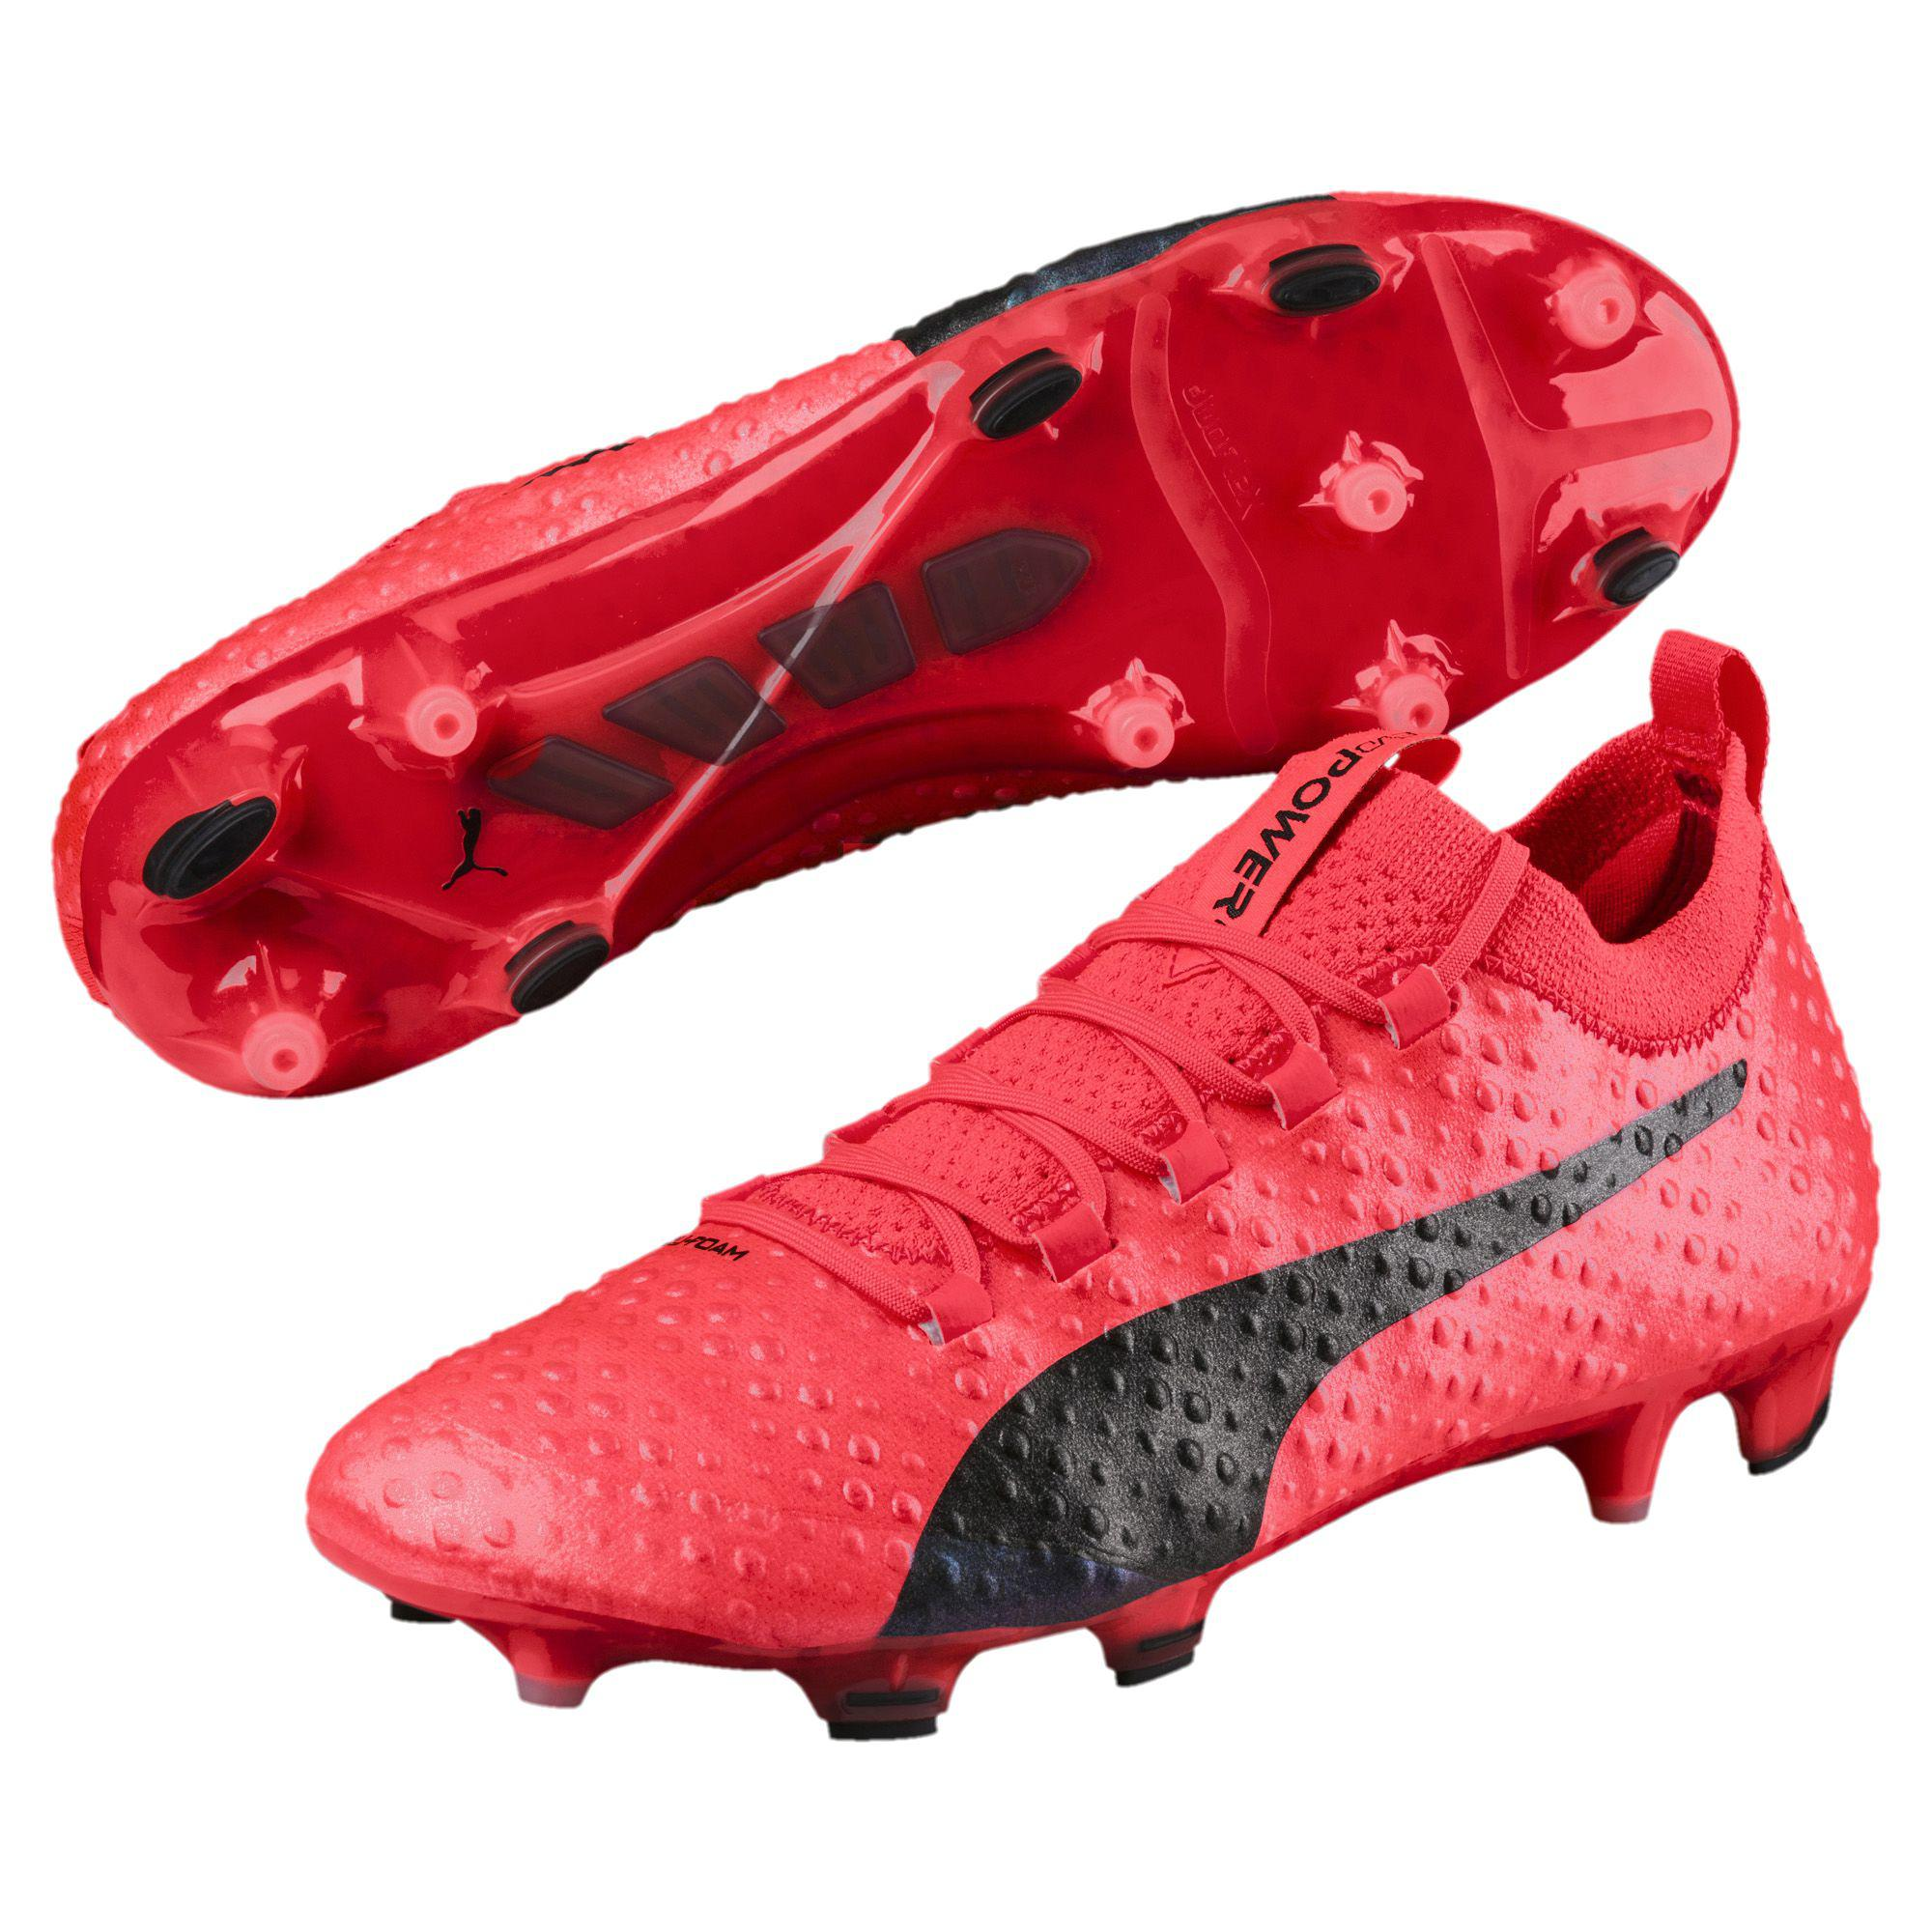 cb10c1c2a Lyst - PUMA Evopower Vigor 3d 1 Fg Men s Firm Ground Soccer Cleats ...